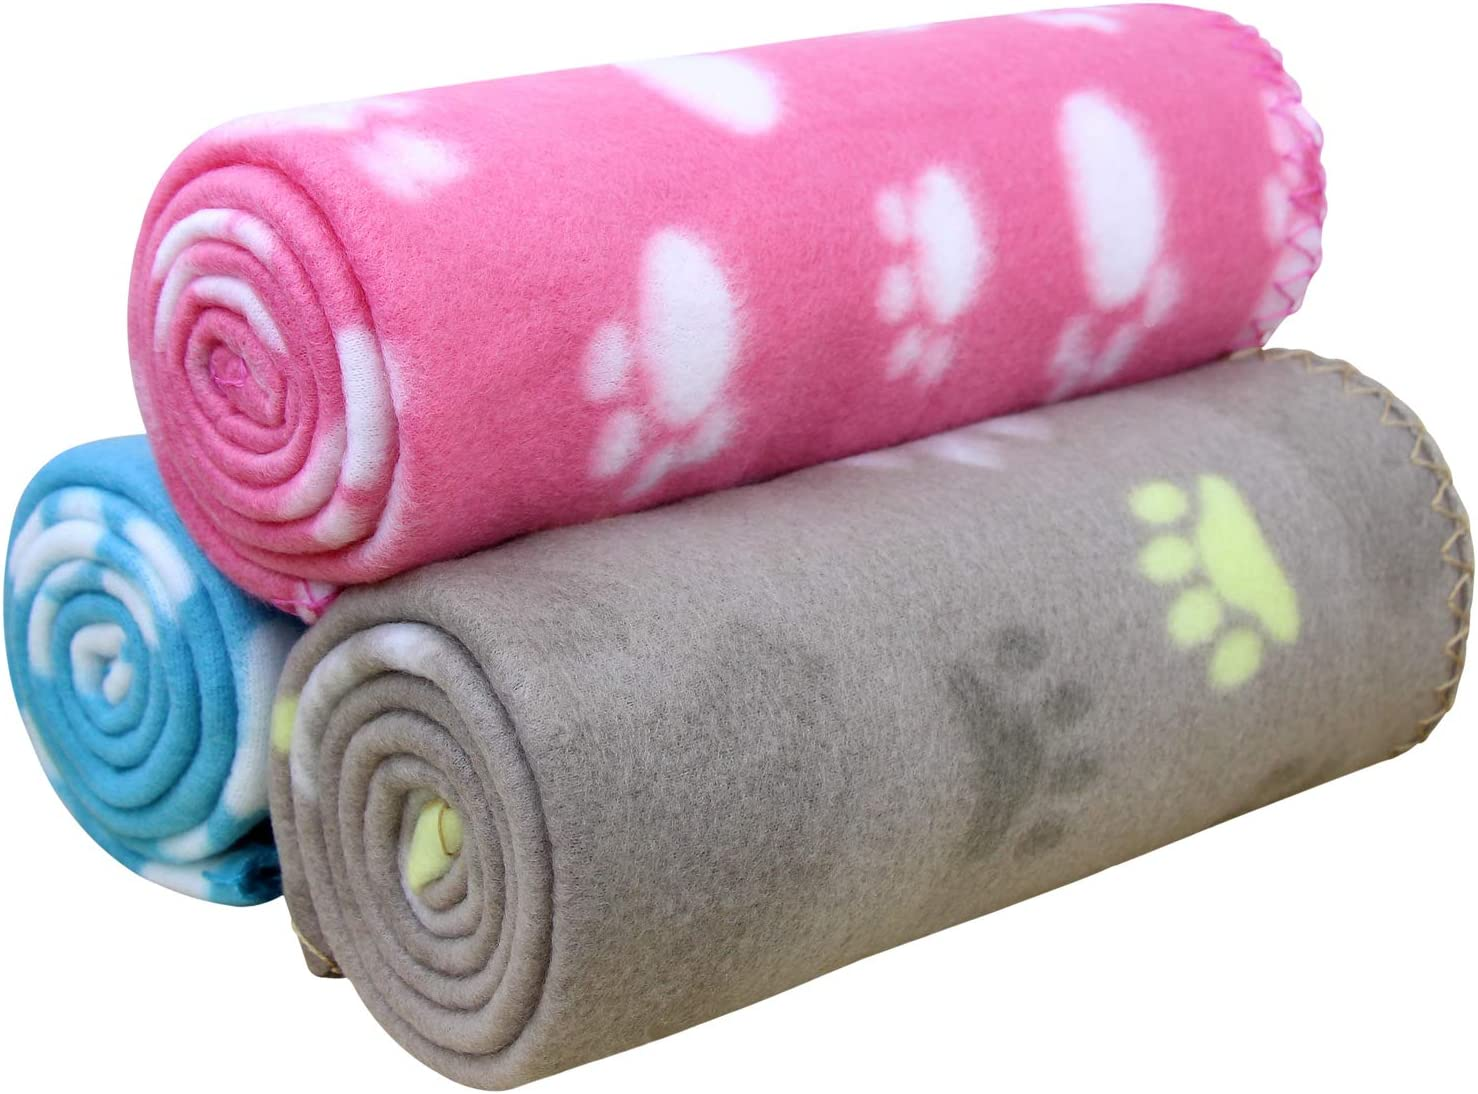 AK KYC Dog Fleece Blankets